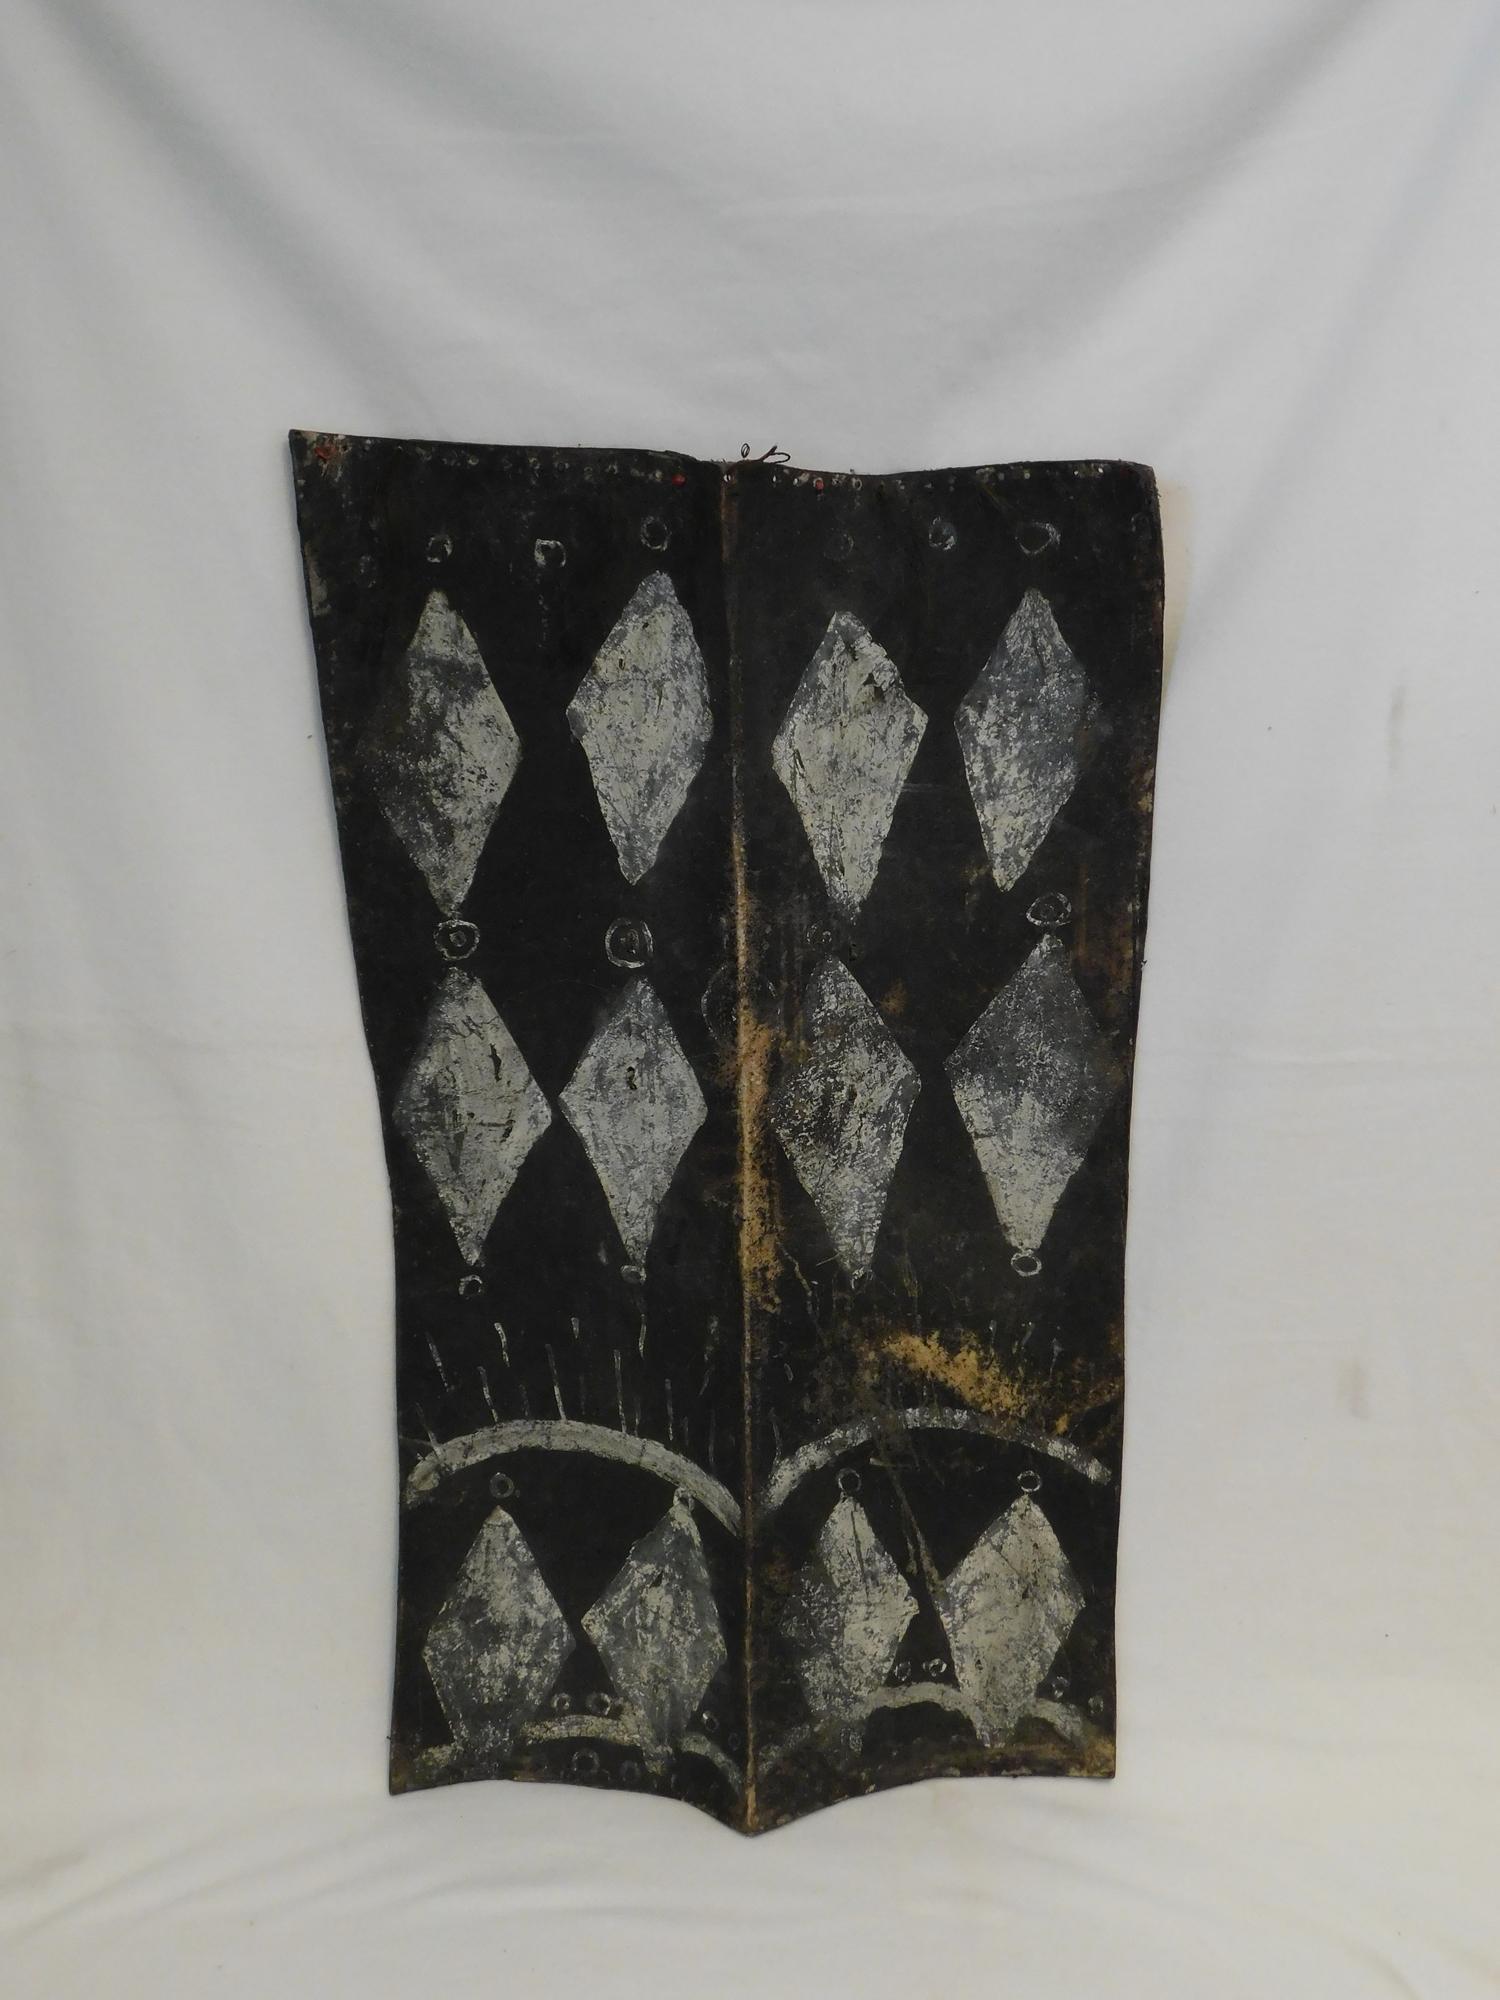 Lot 231 - Naga (India/Burma) headhunters hide shield with geometric paint decoration adorned with hair